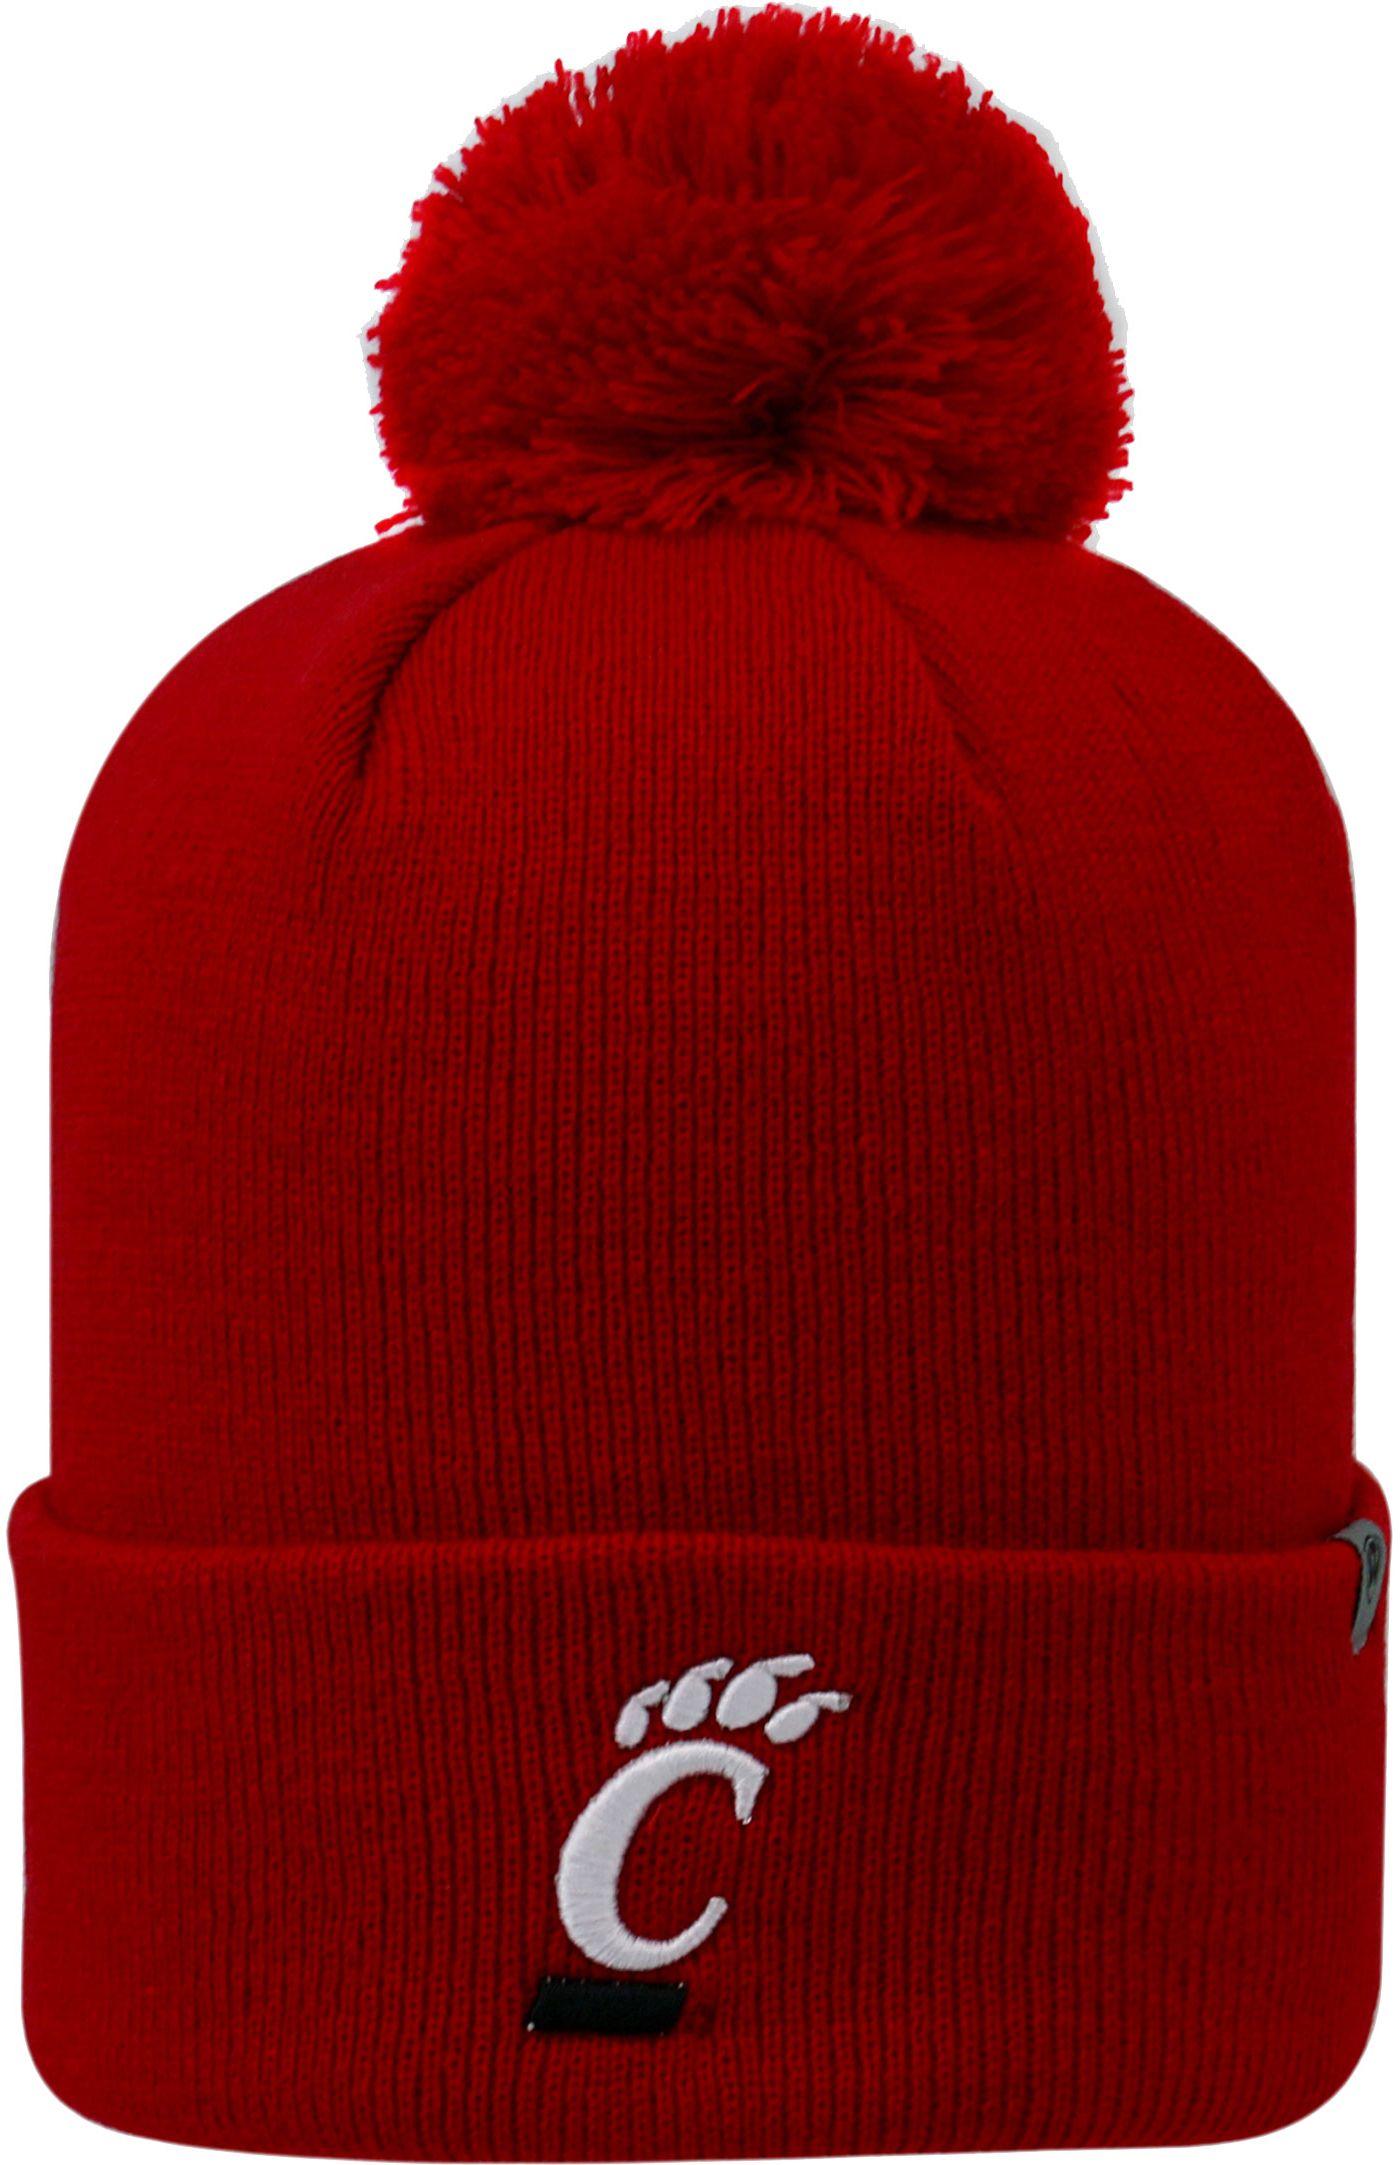 Top of the World Men's Cincinnati Bearcats Red Pom Knit Beanie